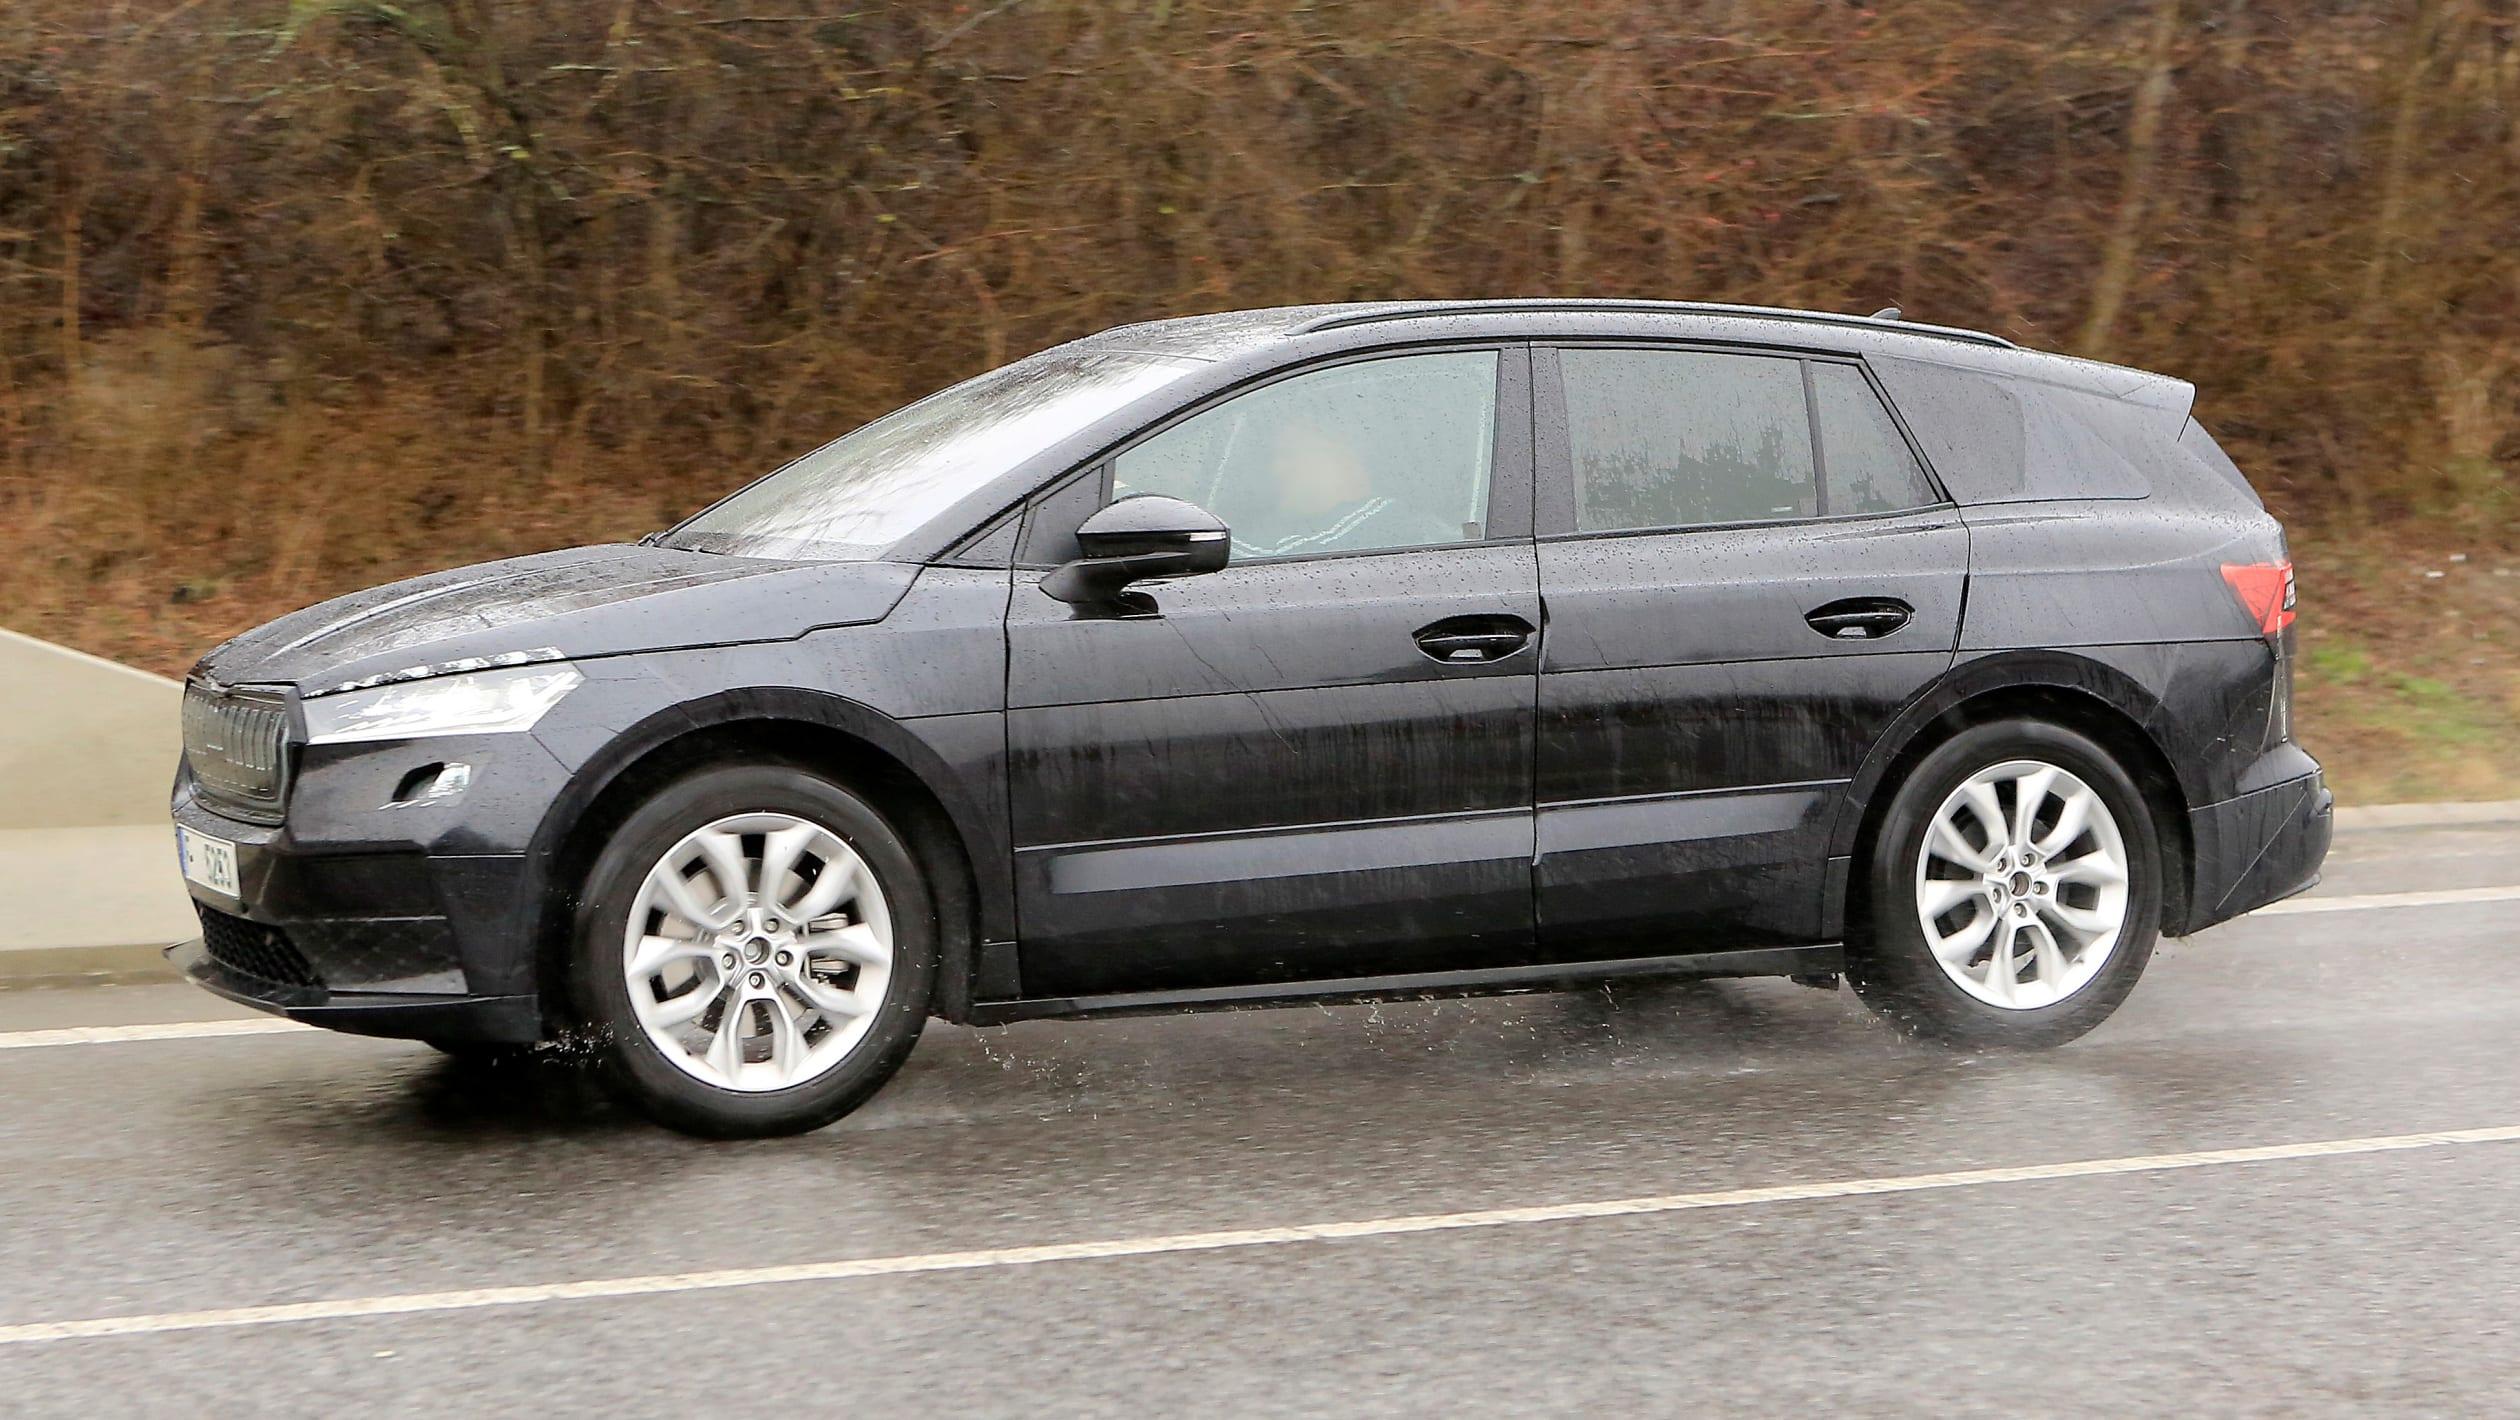 2021 - [Skoda] SUV EV - Page 3 2021%20Skoda%20Enyaq%20spied-5